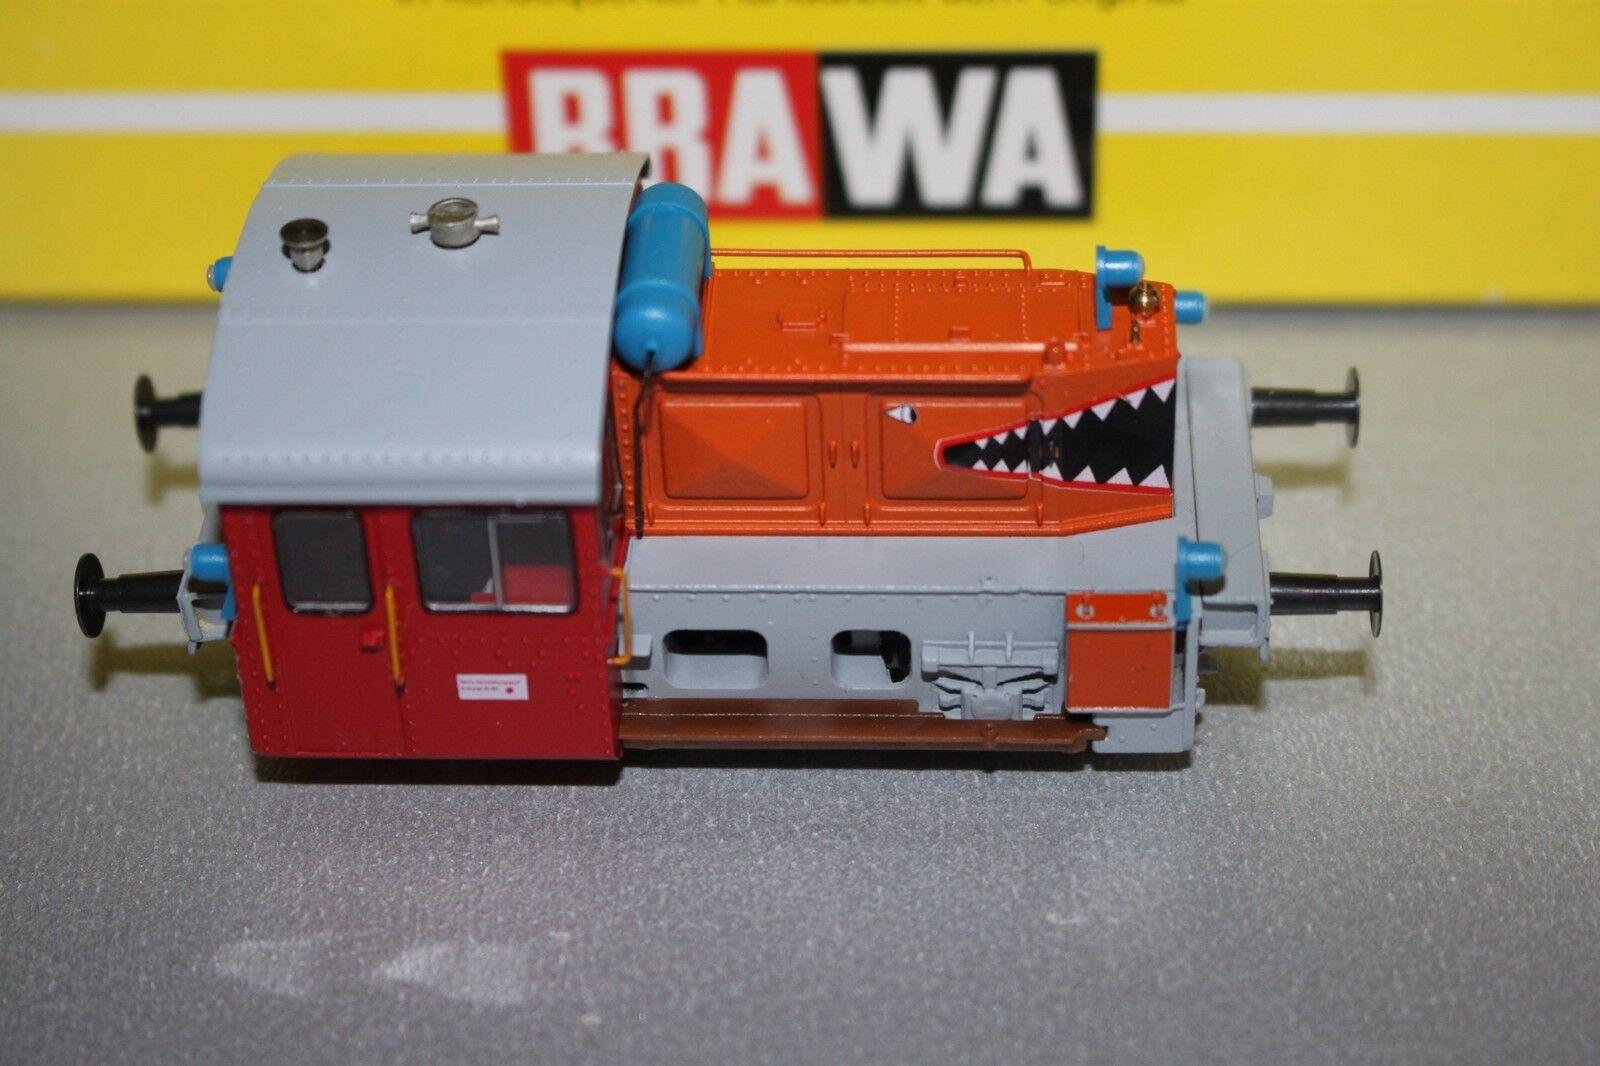 Brawa 0459 Diesellok Köf II Haifischmaul 1 87 Spur H0 OVP